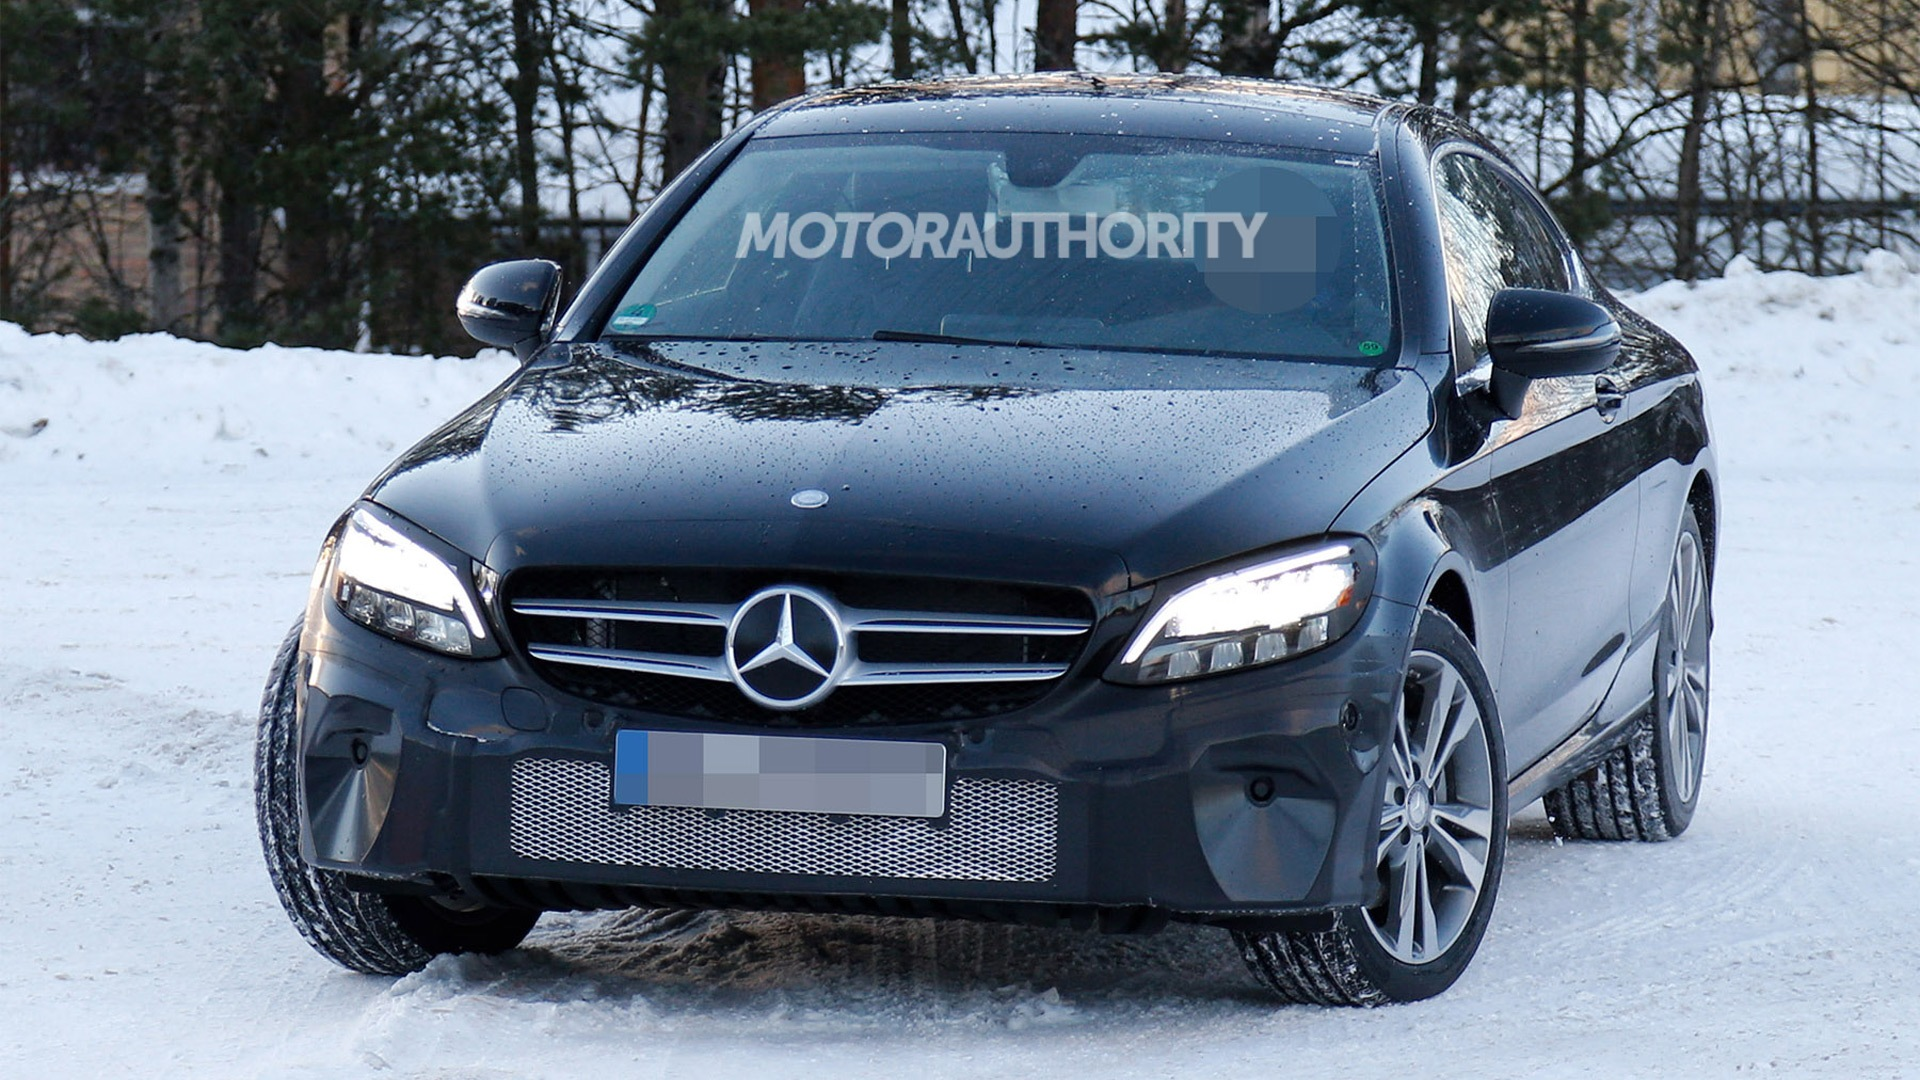 34 Gallery of 2020 Mercedes Benz C Class Spy Shoot with 2020 Mercedes Benz C Class